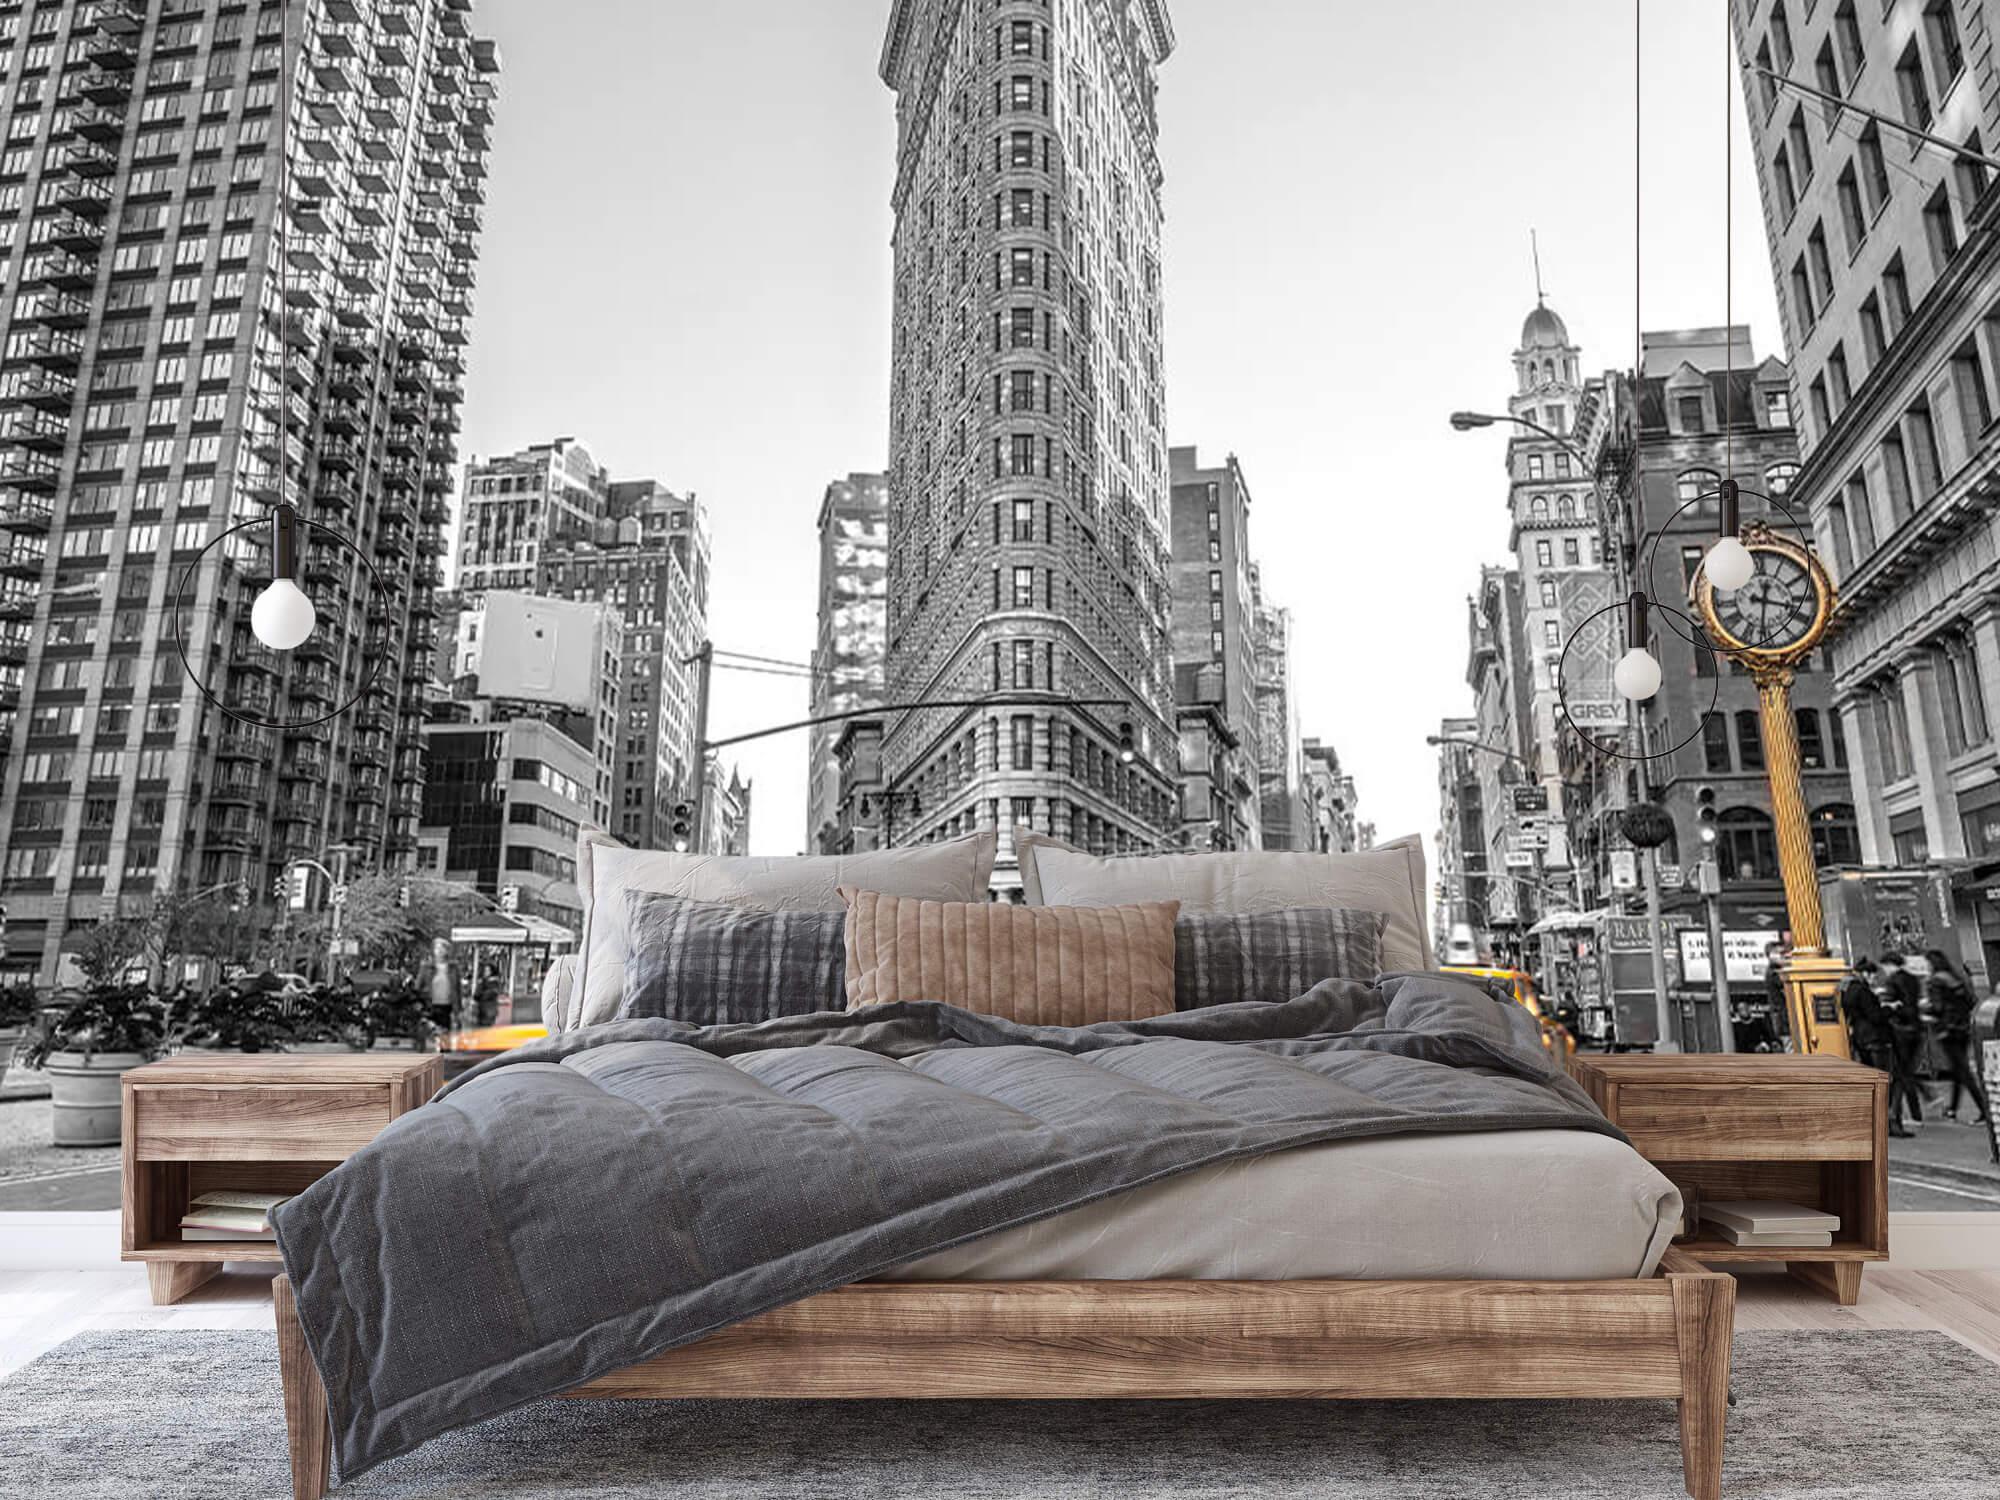 Rue animée à New York 6